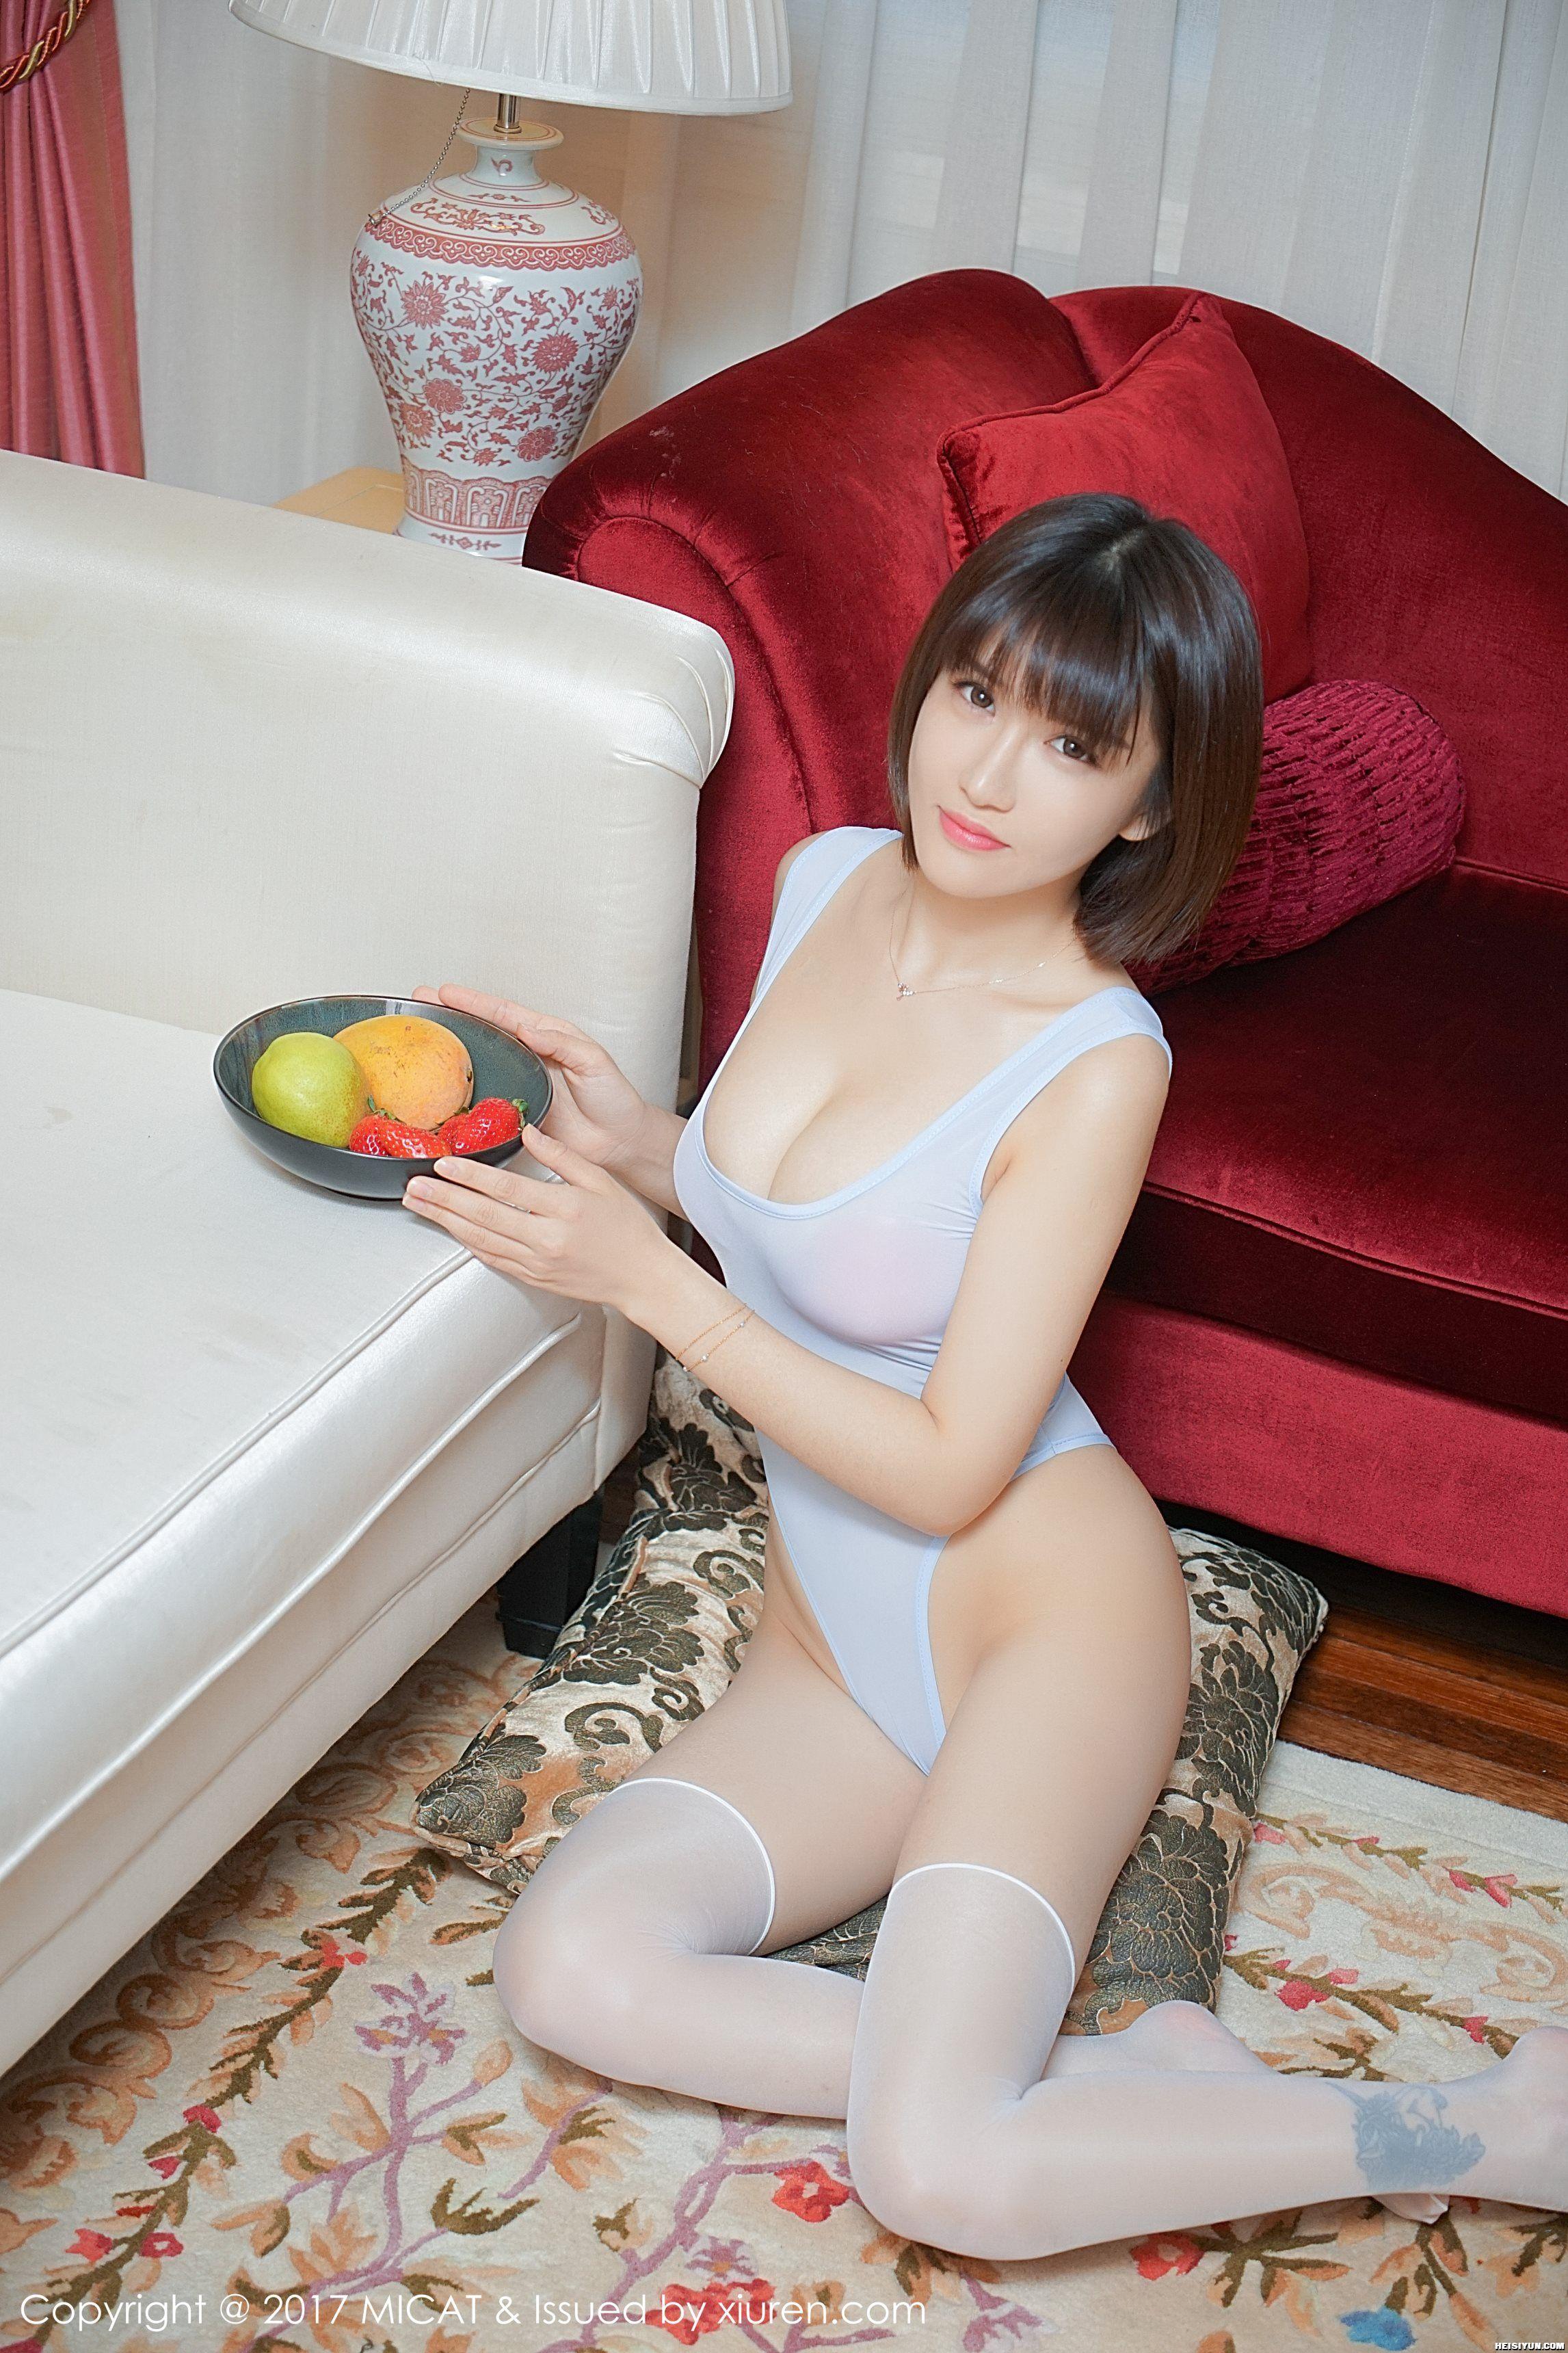 [MICAT猫萌榜] 2017.06.16 Vol.011 K8傲娇萌萌Vivian [52+1P ]